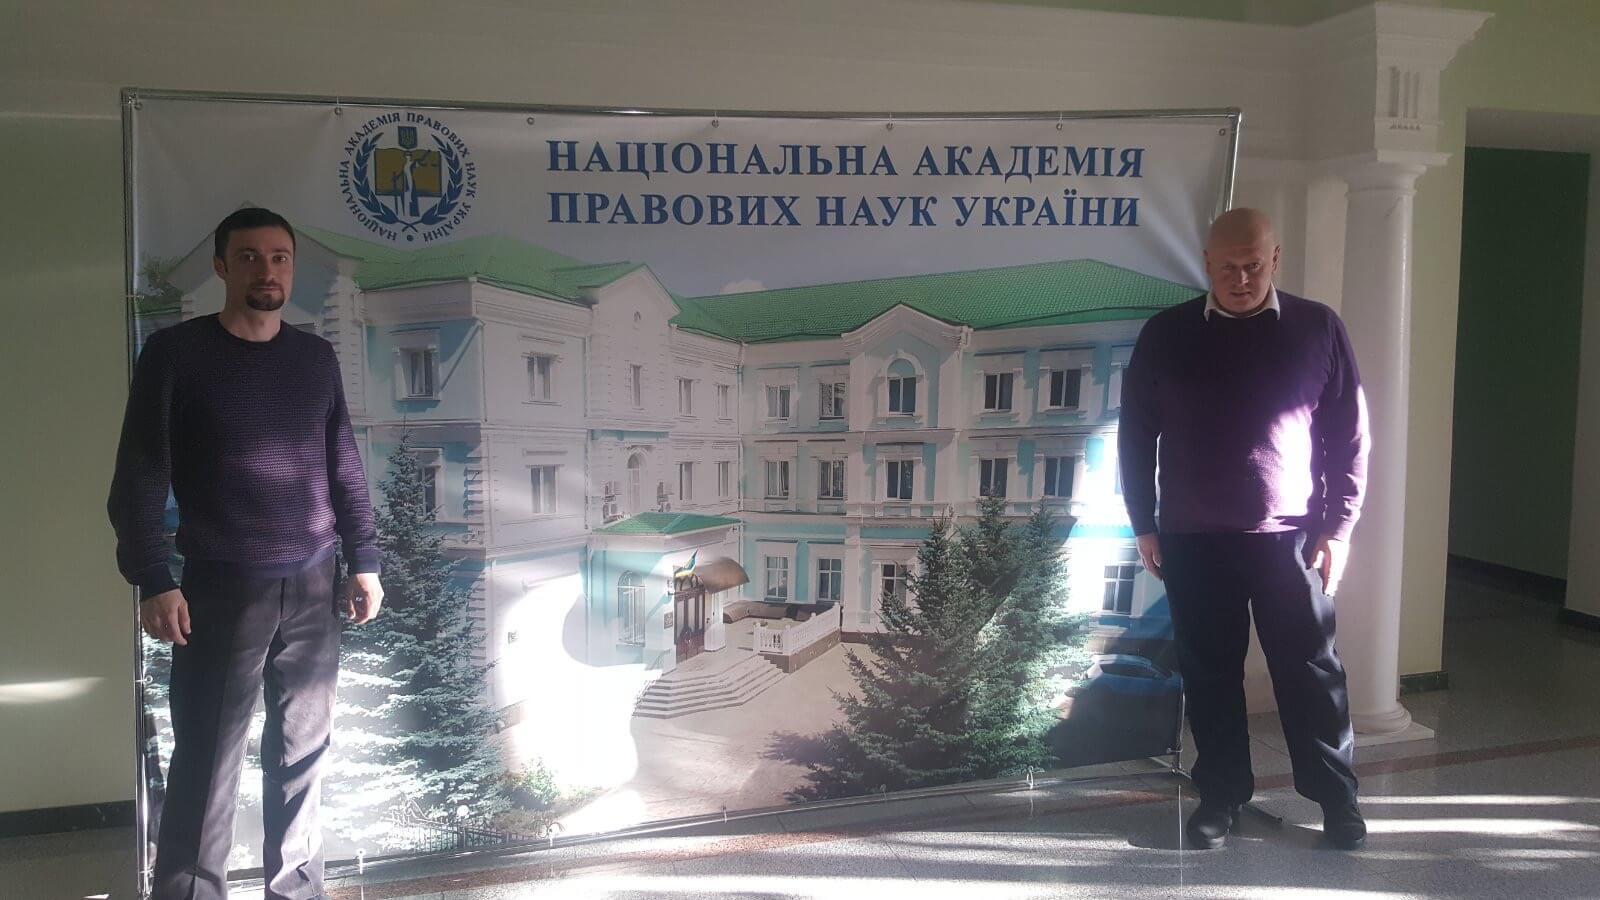 Vitalii Vdovichen and Yurii Patsurkivskyy